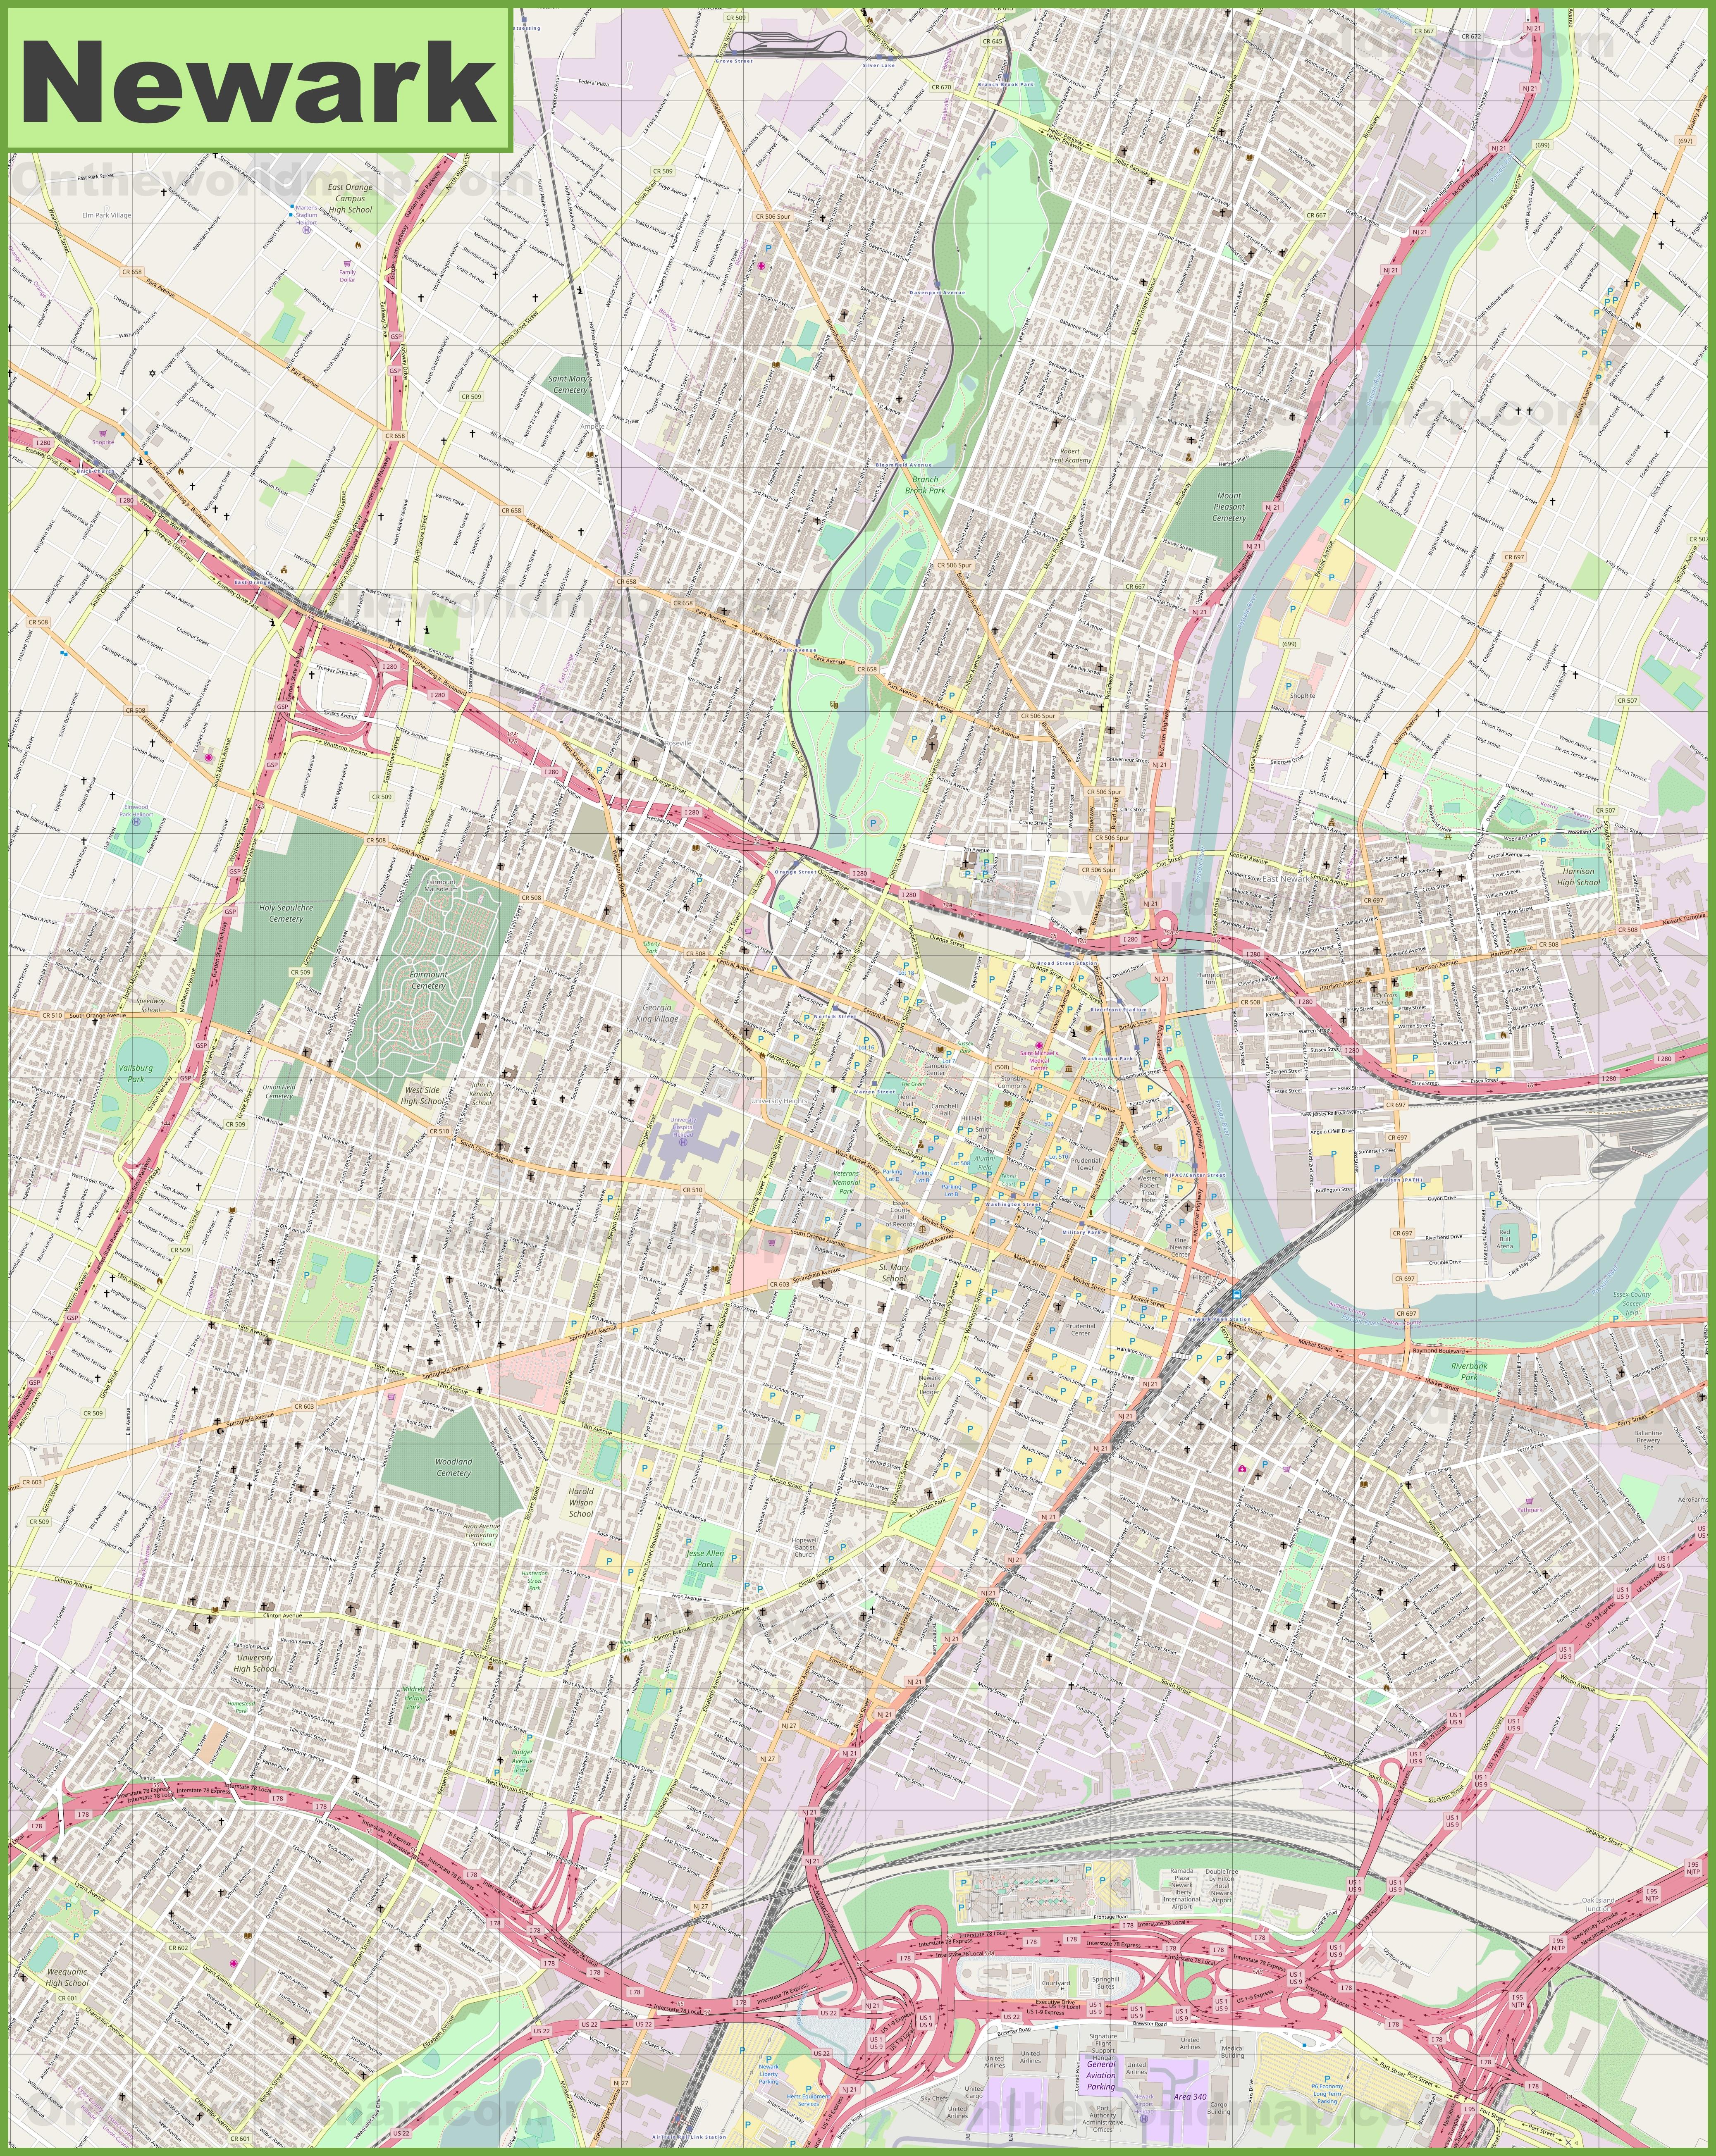 Newark Maps New Jersey US Maps of Newark